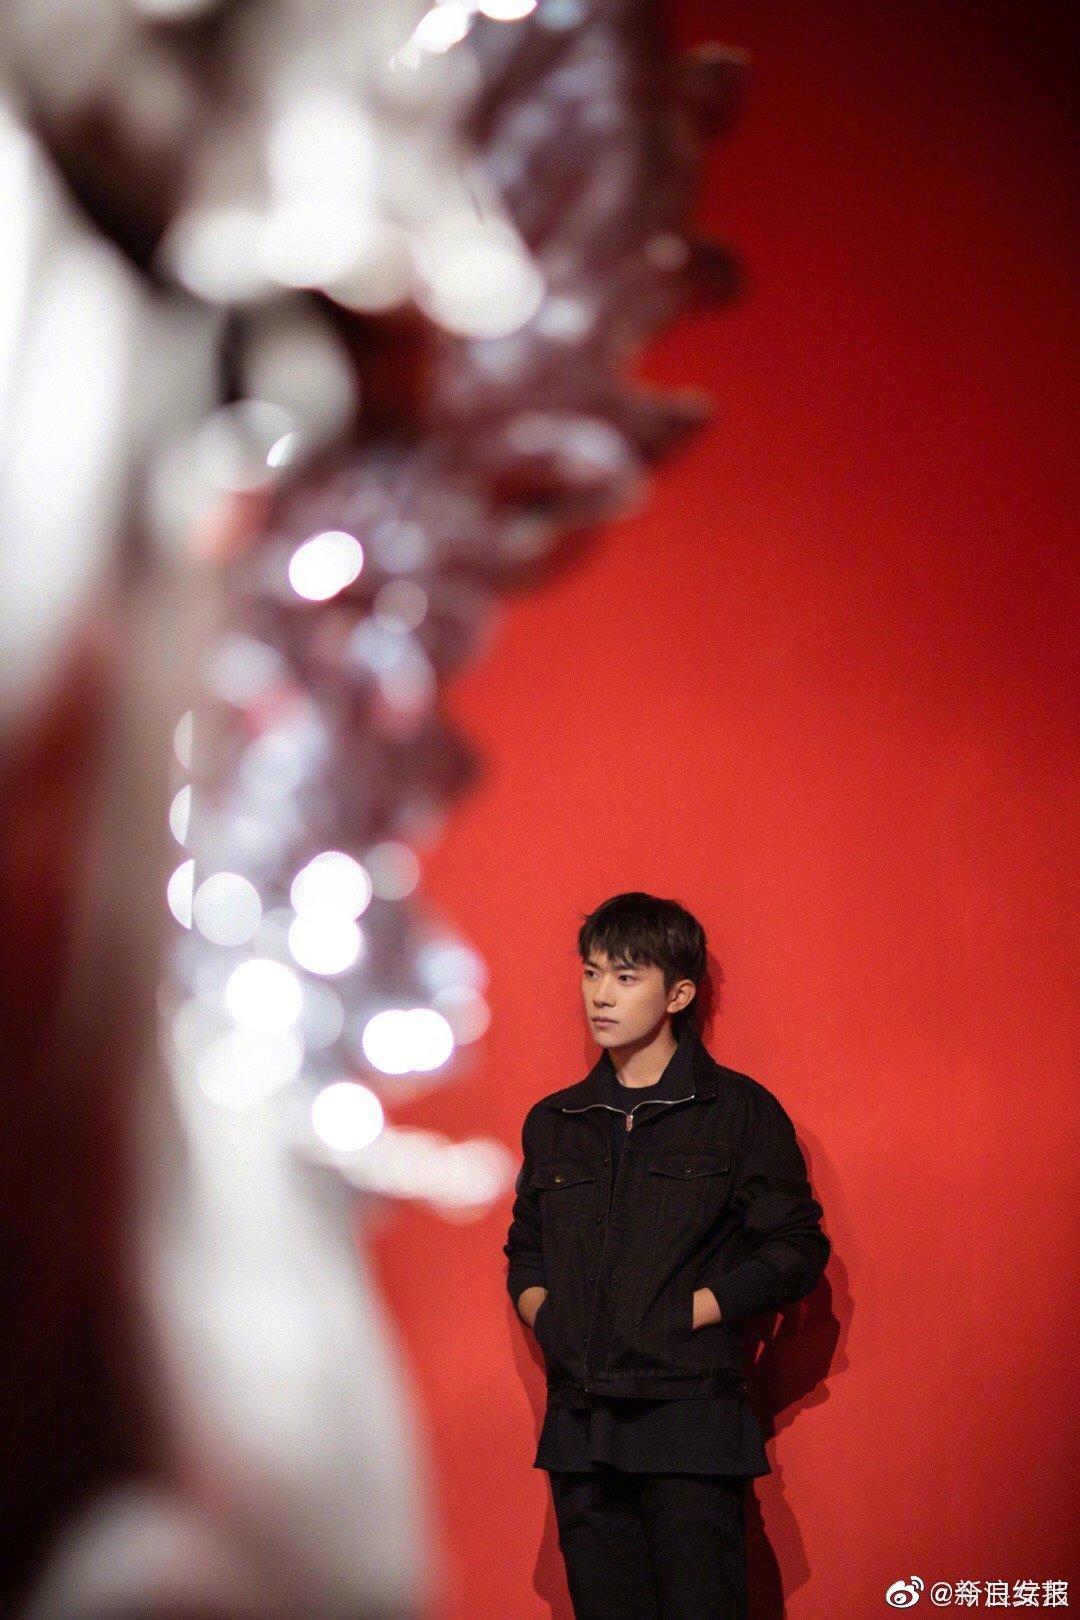 @TFBOYS-易烊千玺 参加雕塑老师任哲的艺术展的现场图曝光